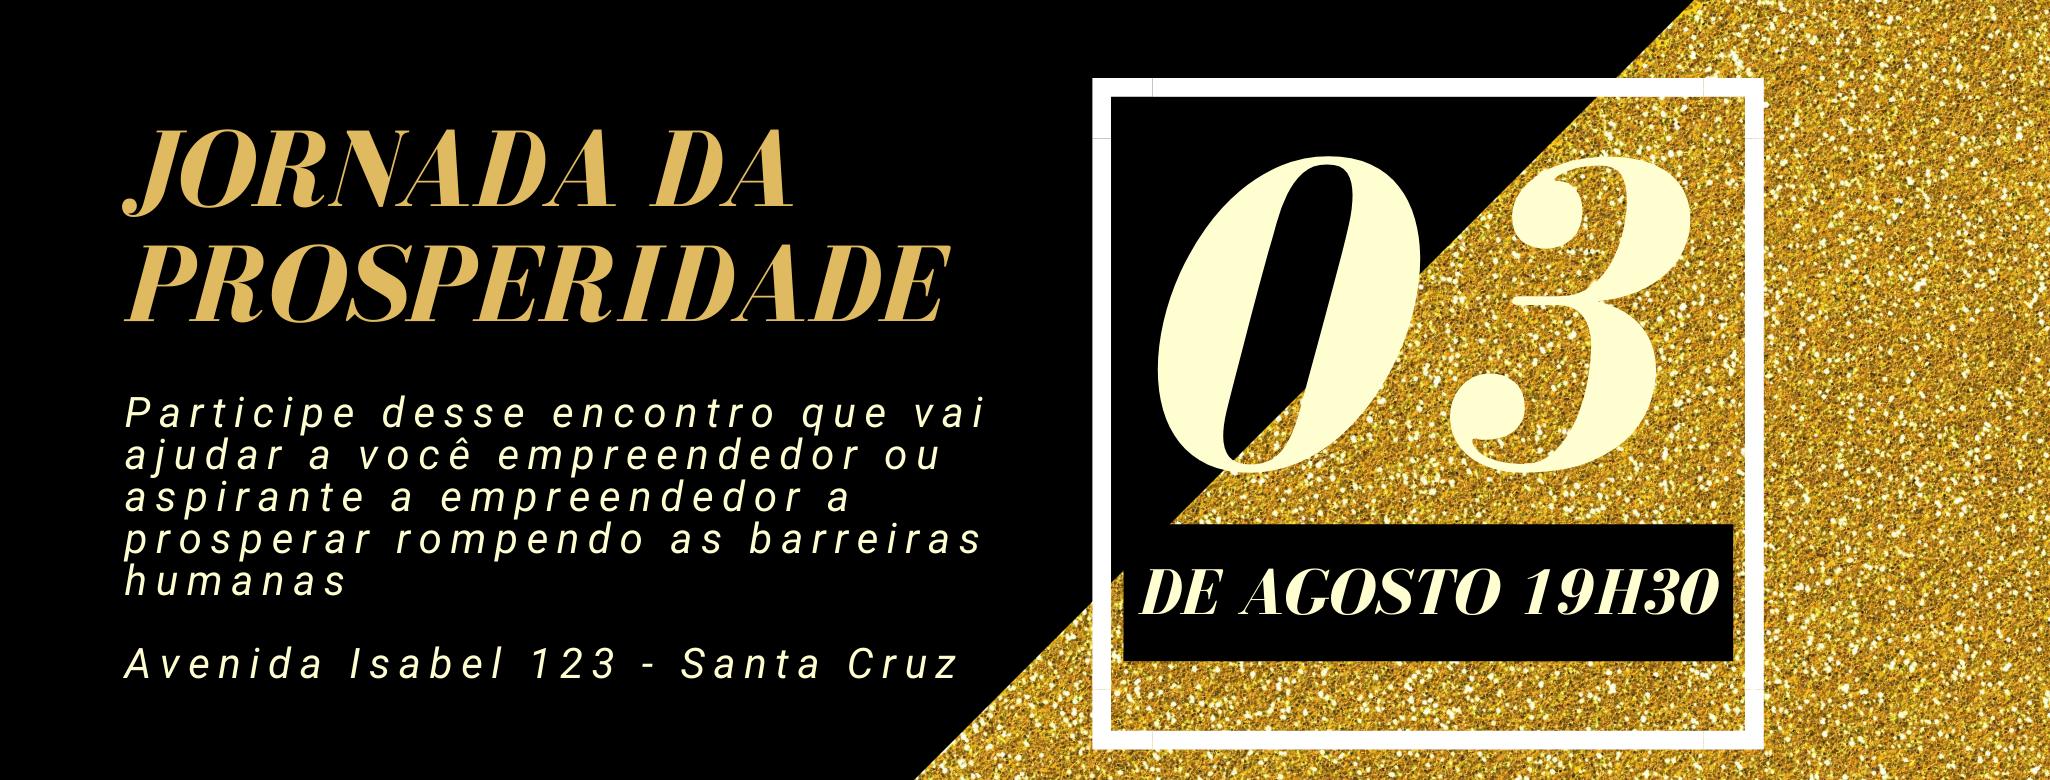 JORNADA DA PROSPERIDADE.png